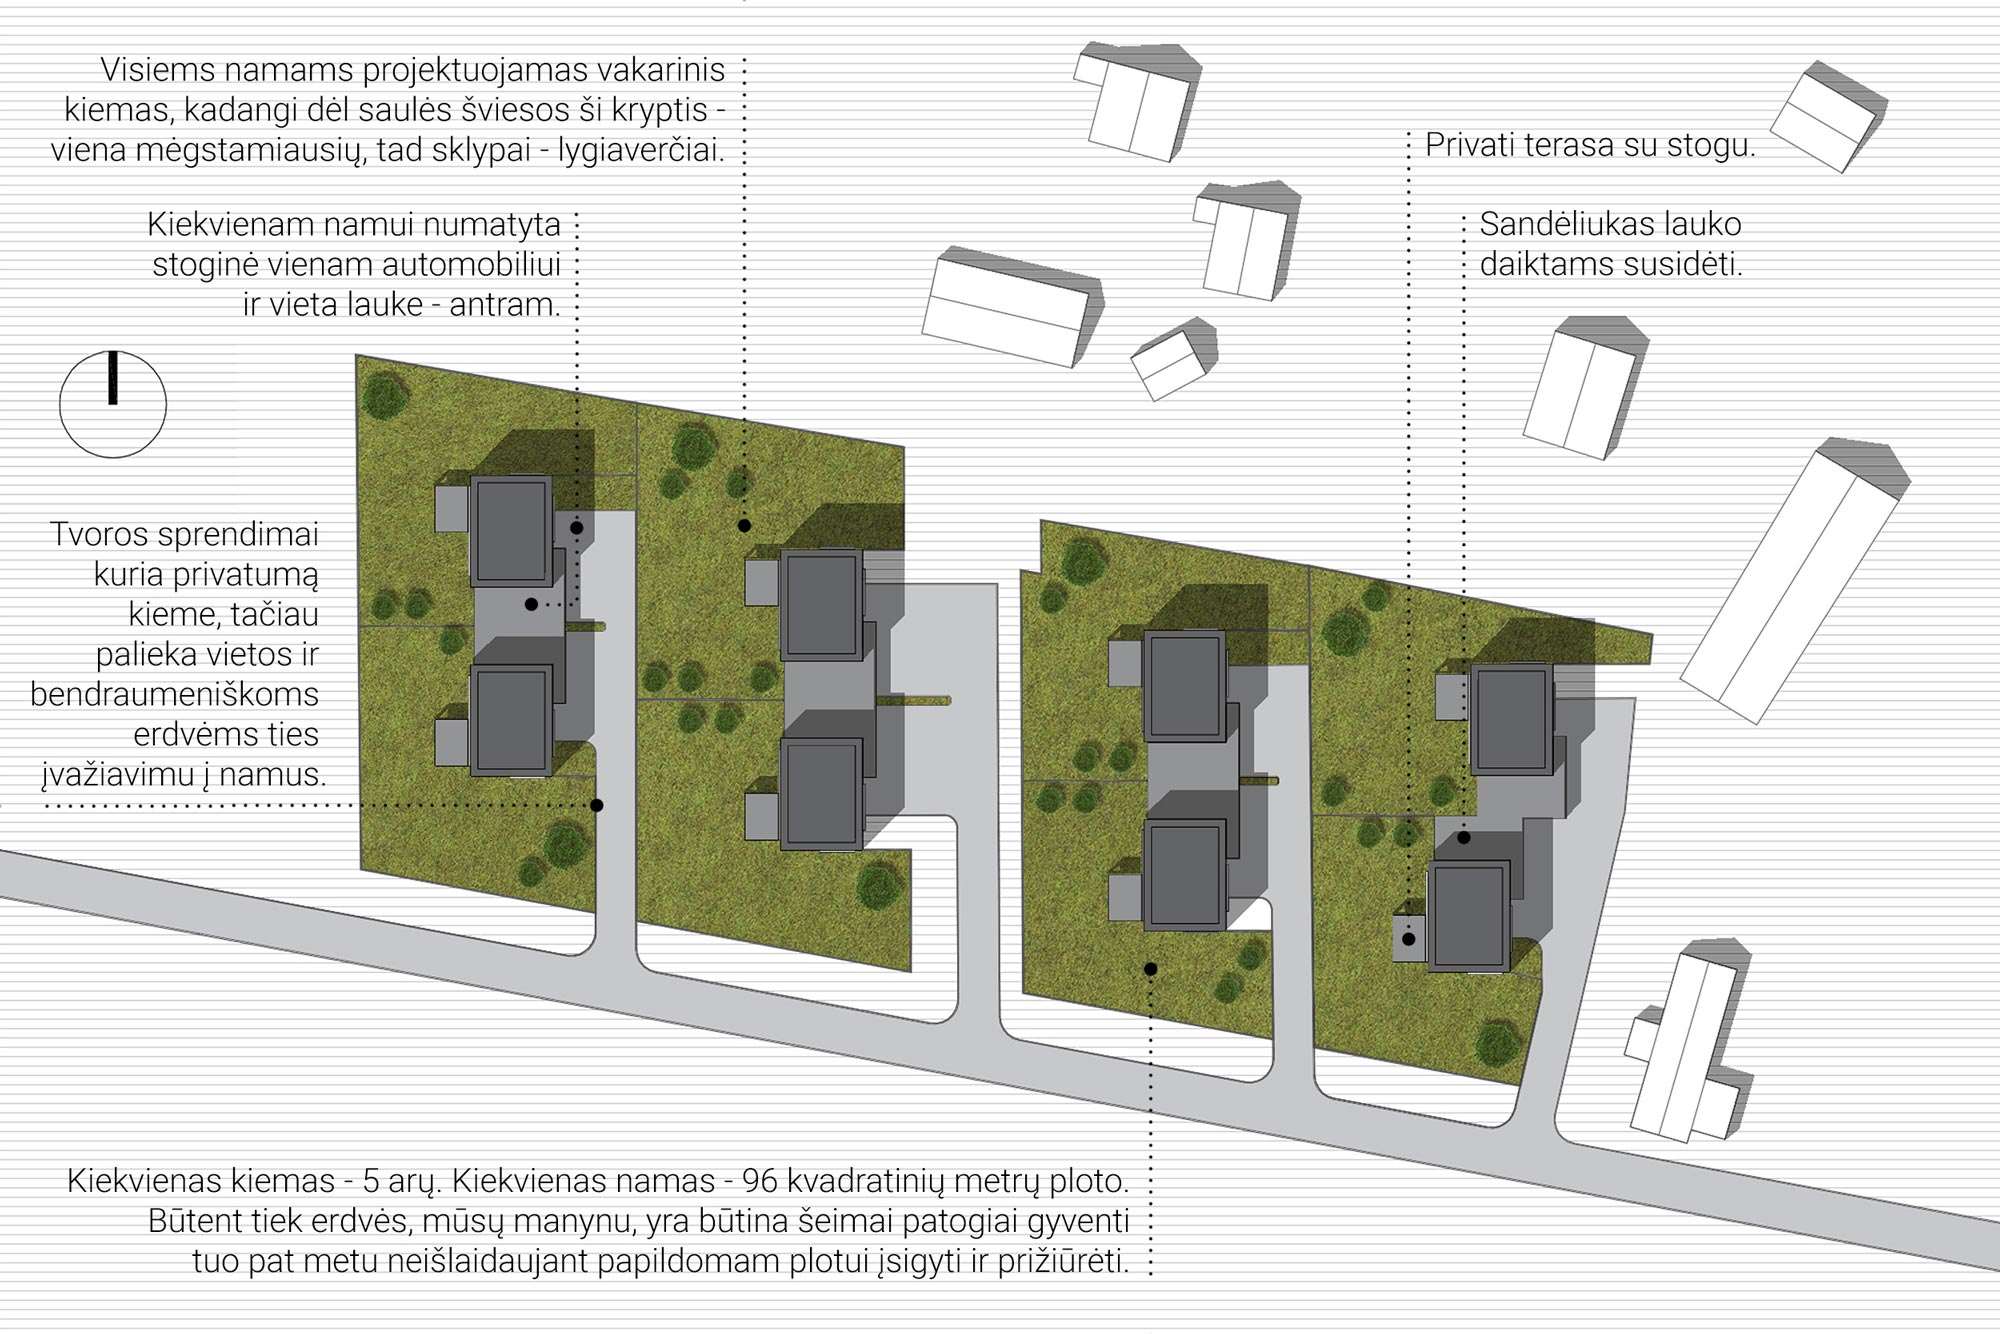 kubinis-metras_balti-balti-namai_kvartalas_sklypo-planas